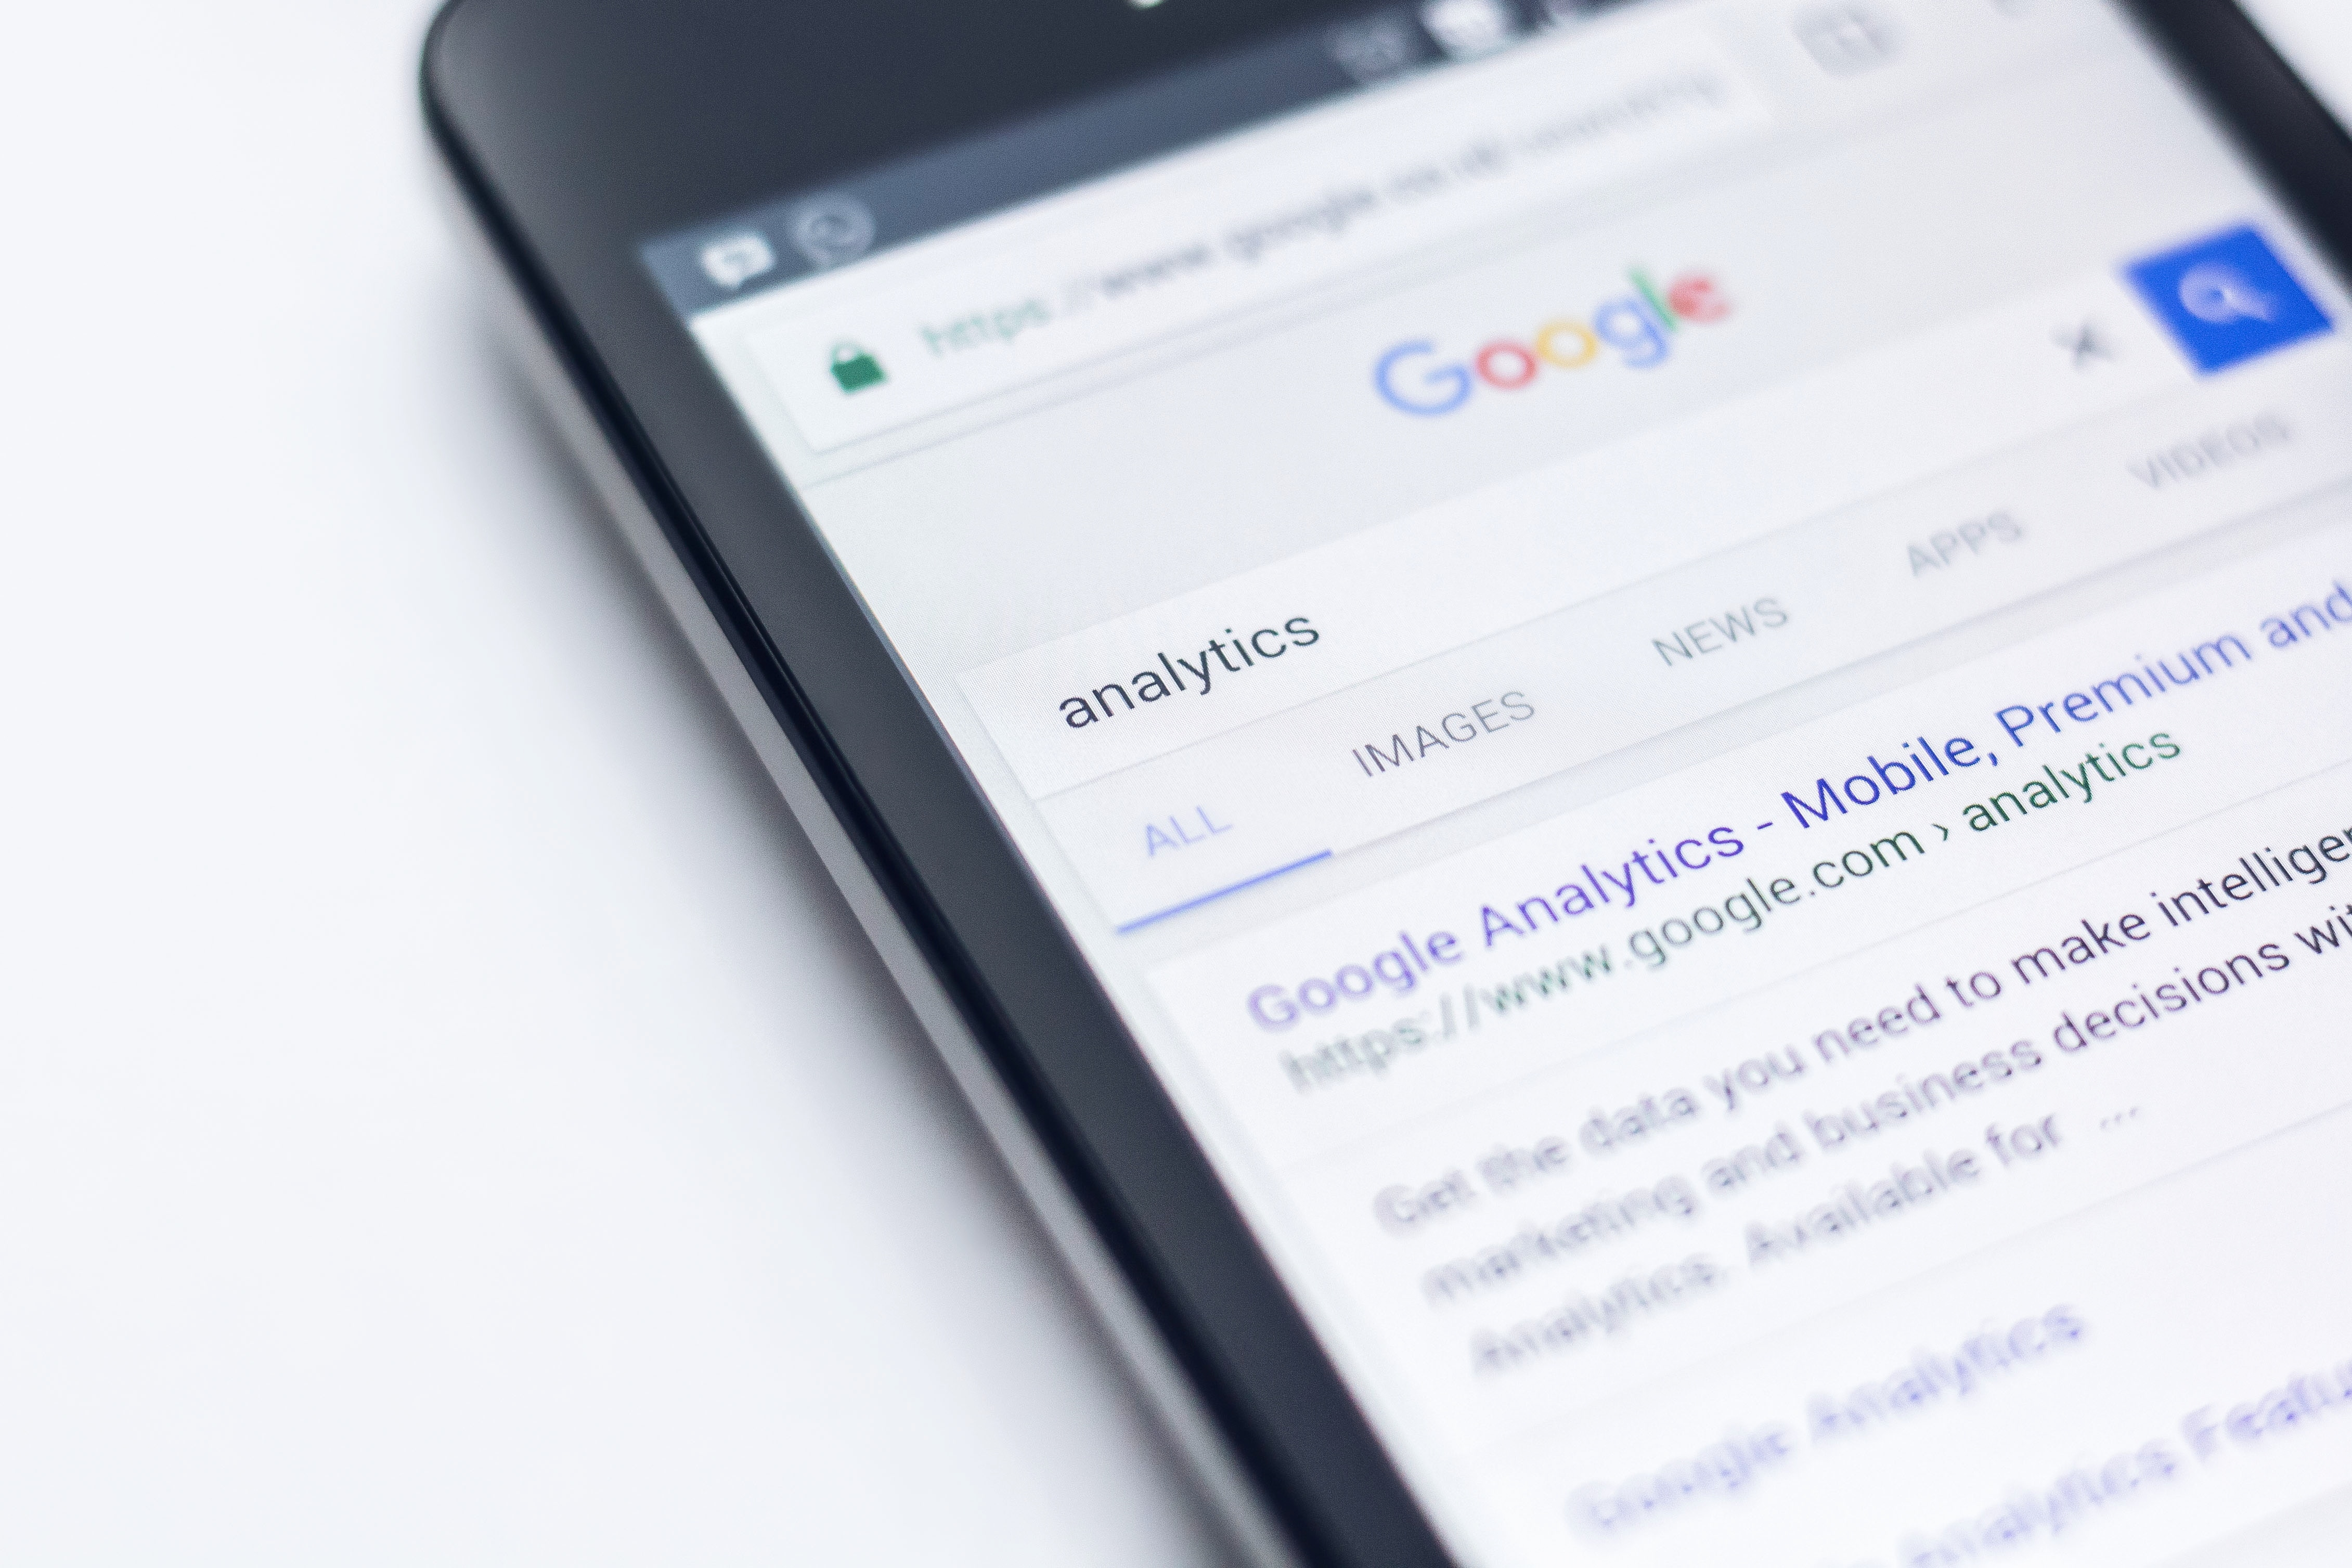 google analytics on smartphone screen